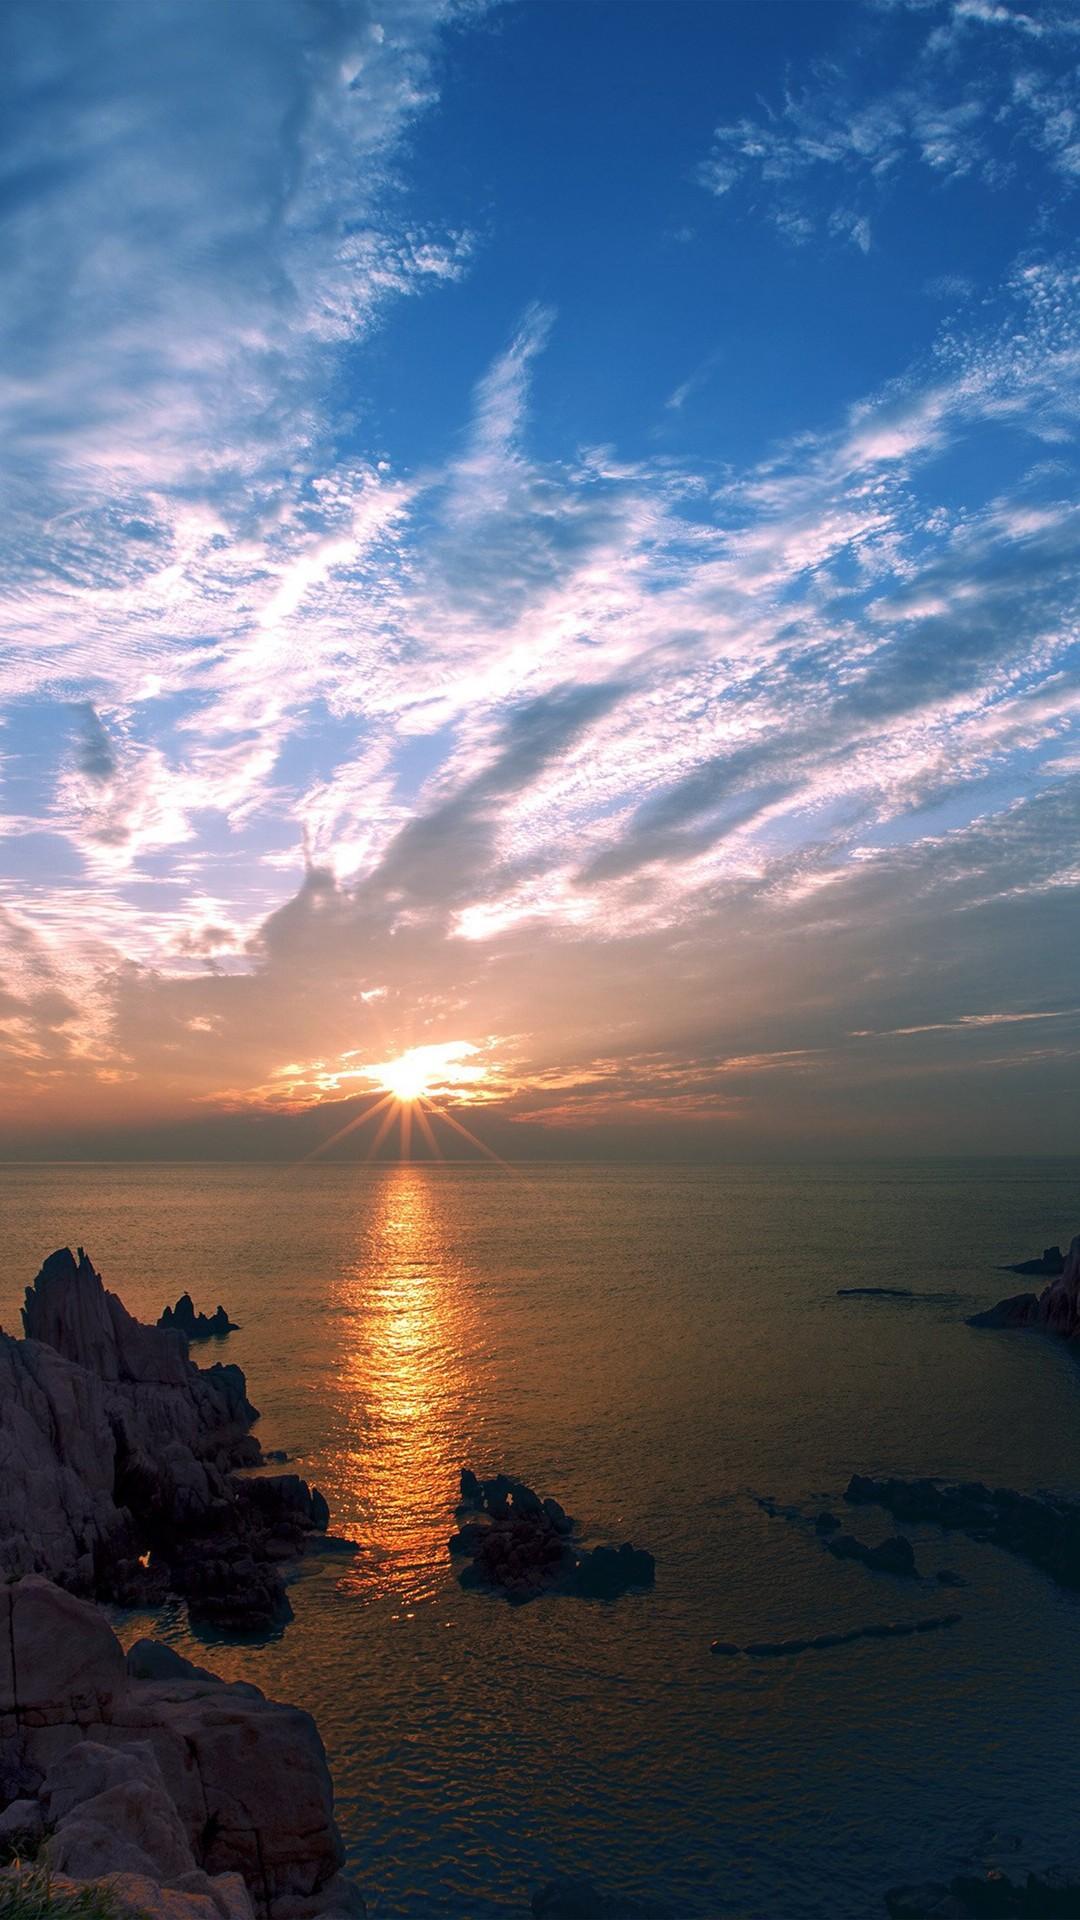 Sunset Sky Cloud Sea Rock Bridge Nature iPhone 6 wallpaper